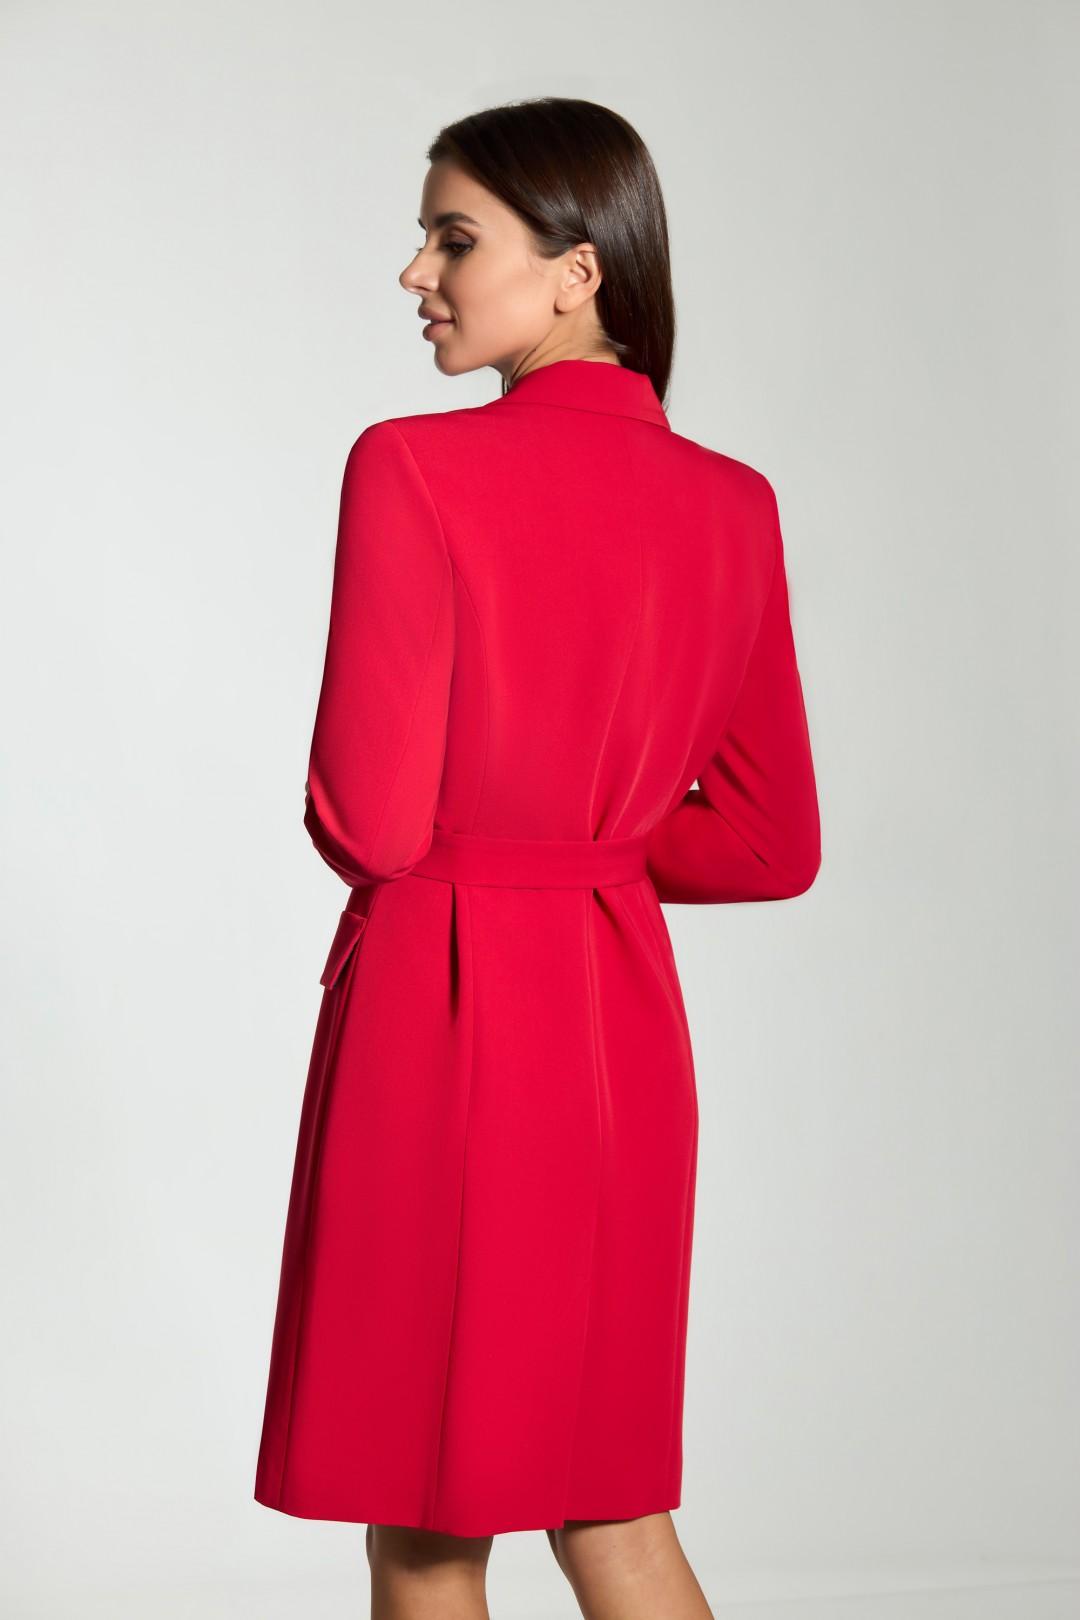 Платье GIZART 7539кр